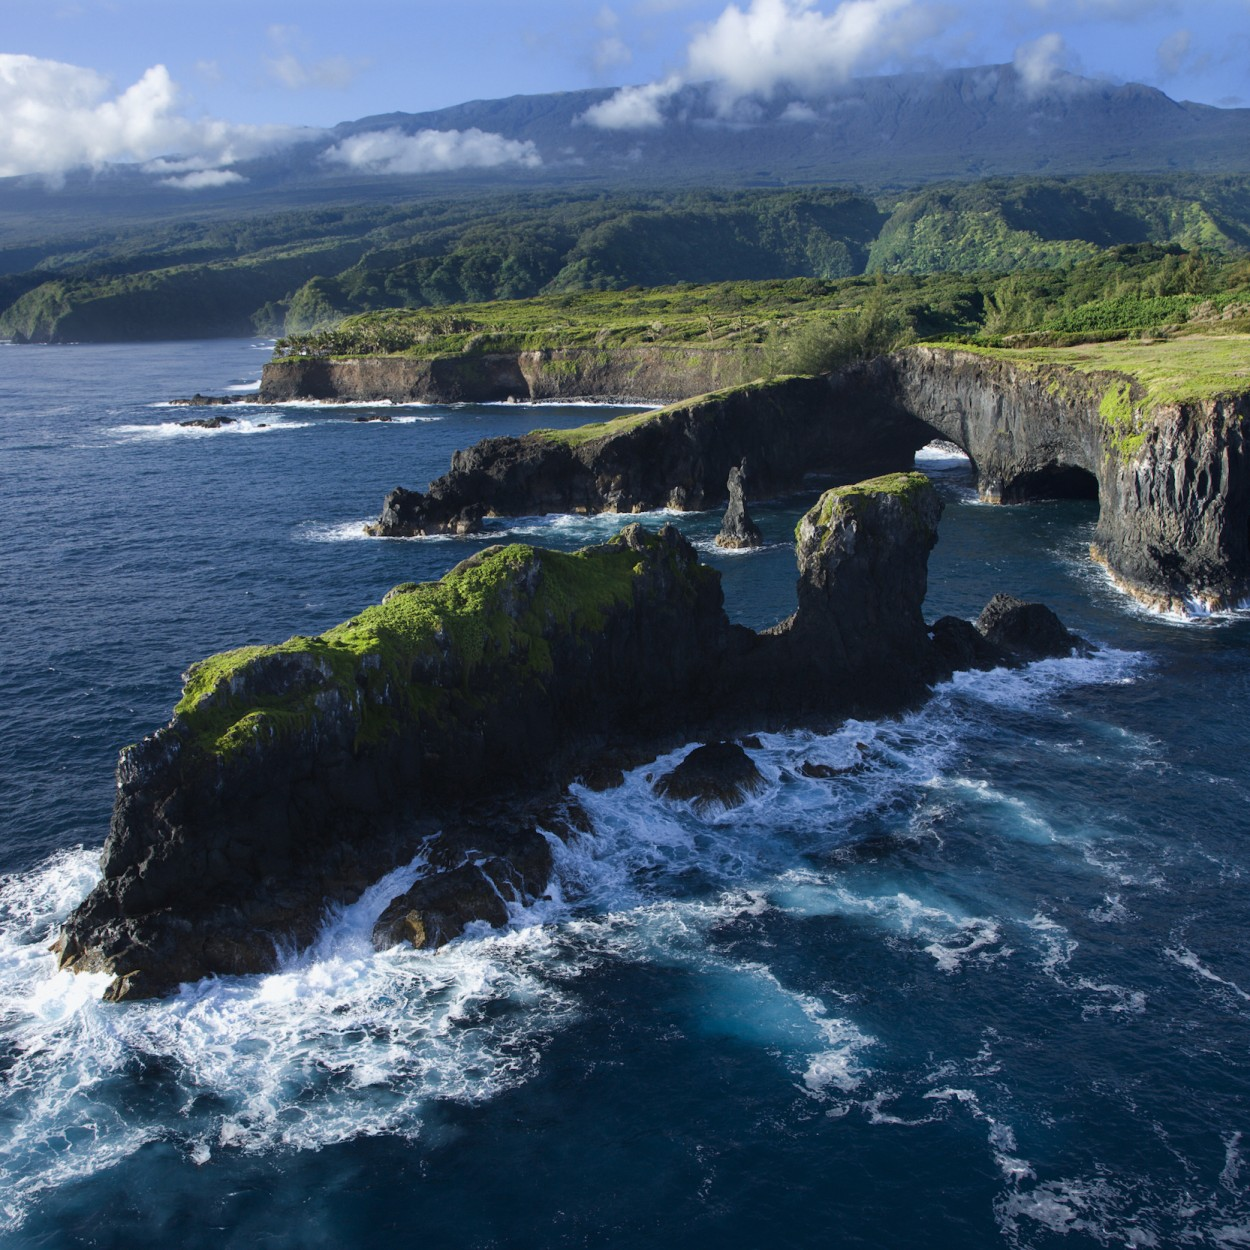 Blue_Soul_Maui_Ocean_10.jpg